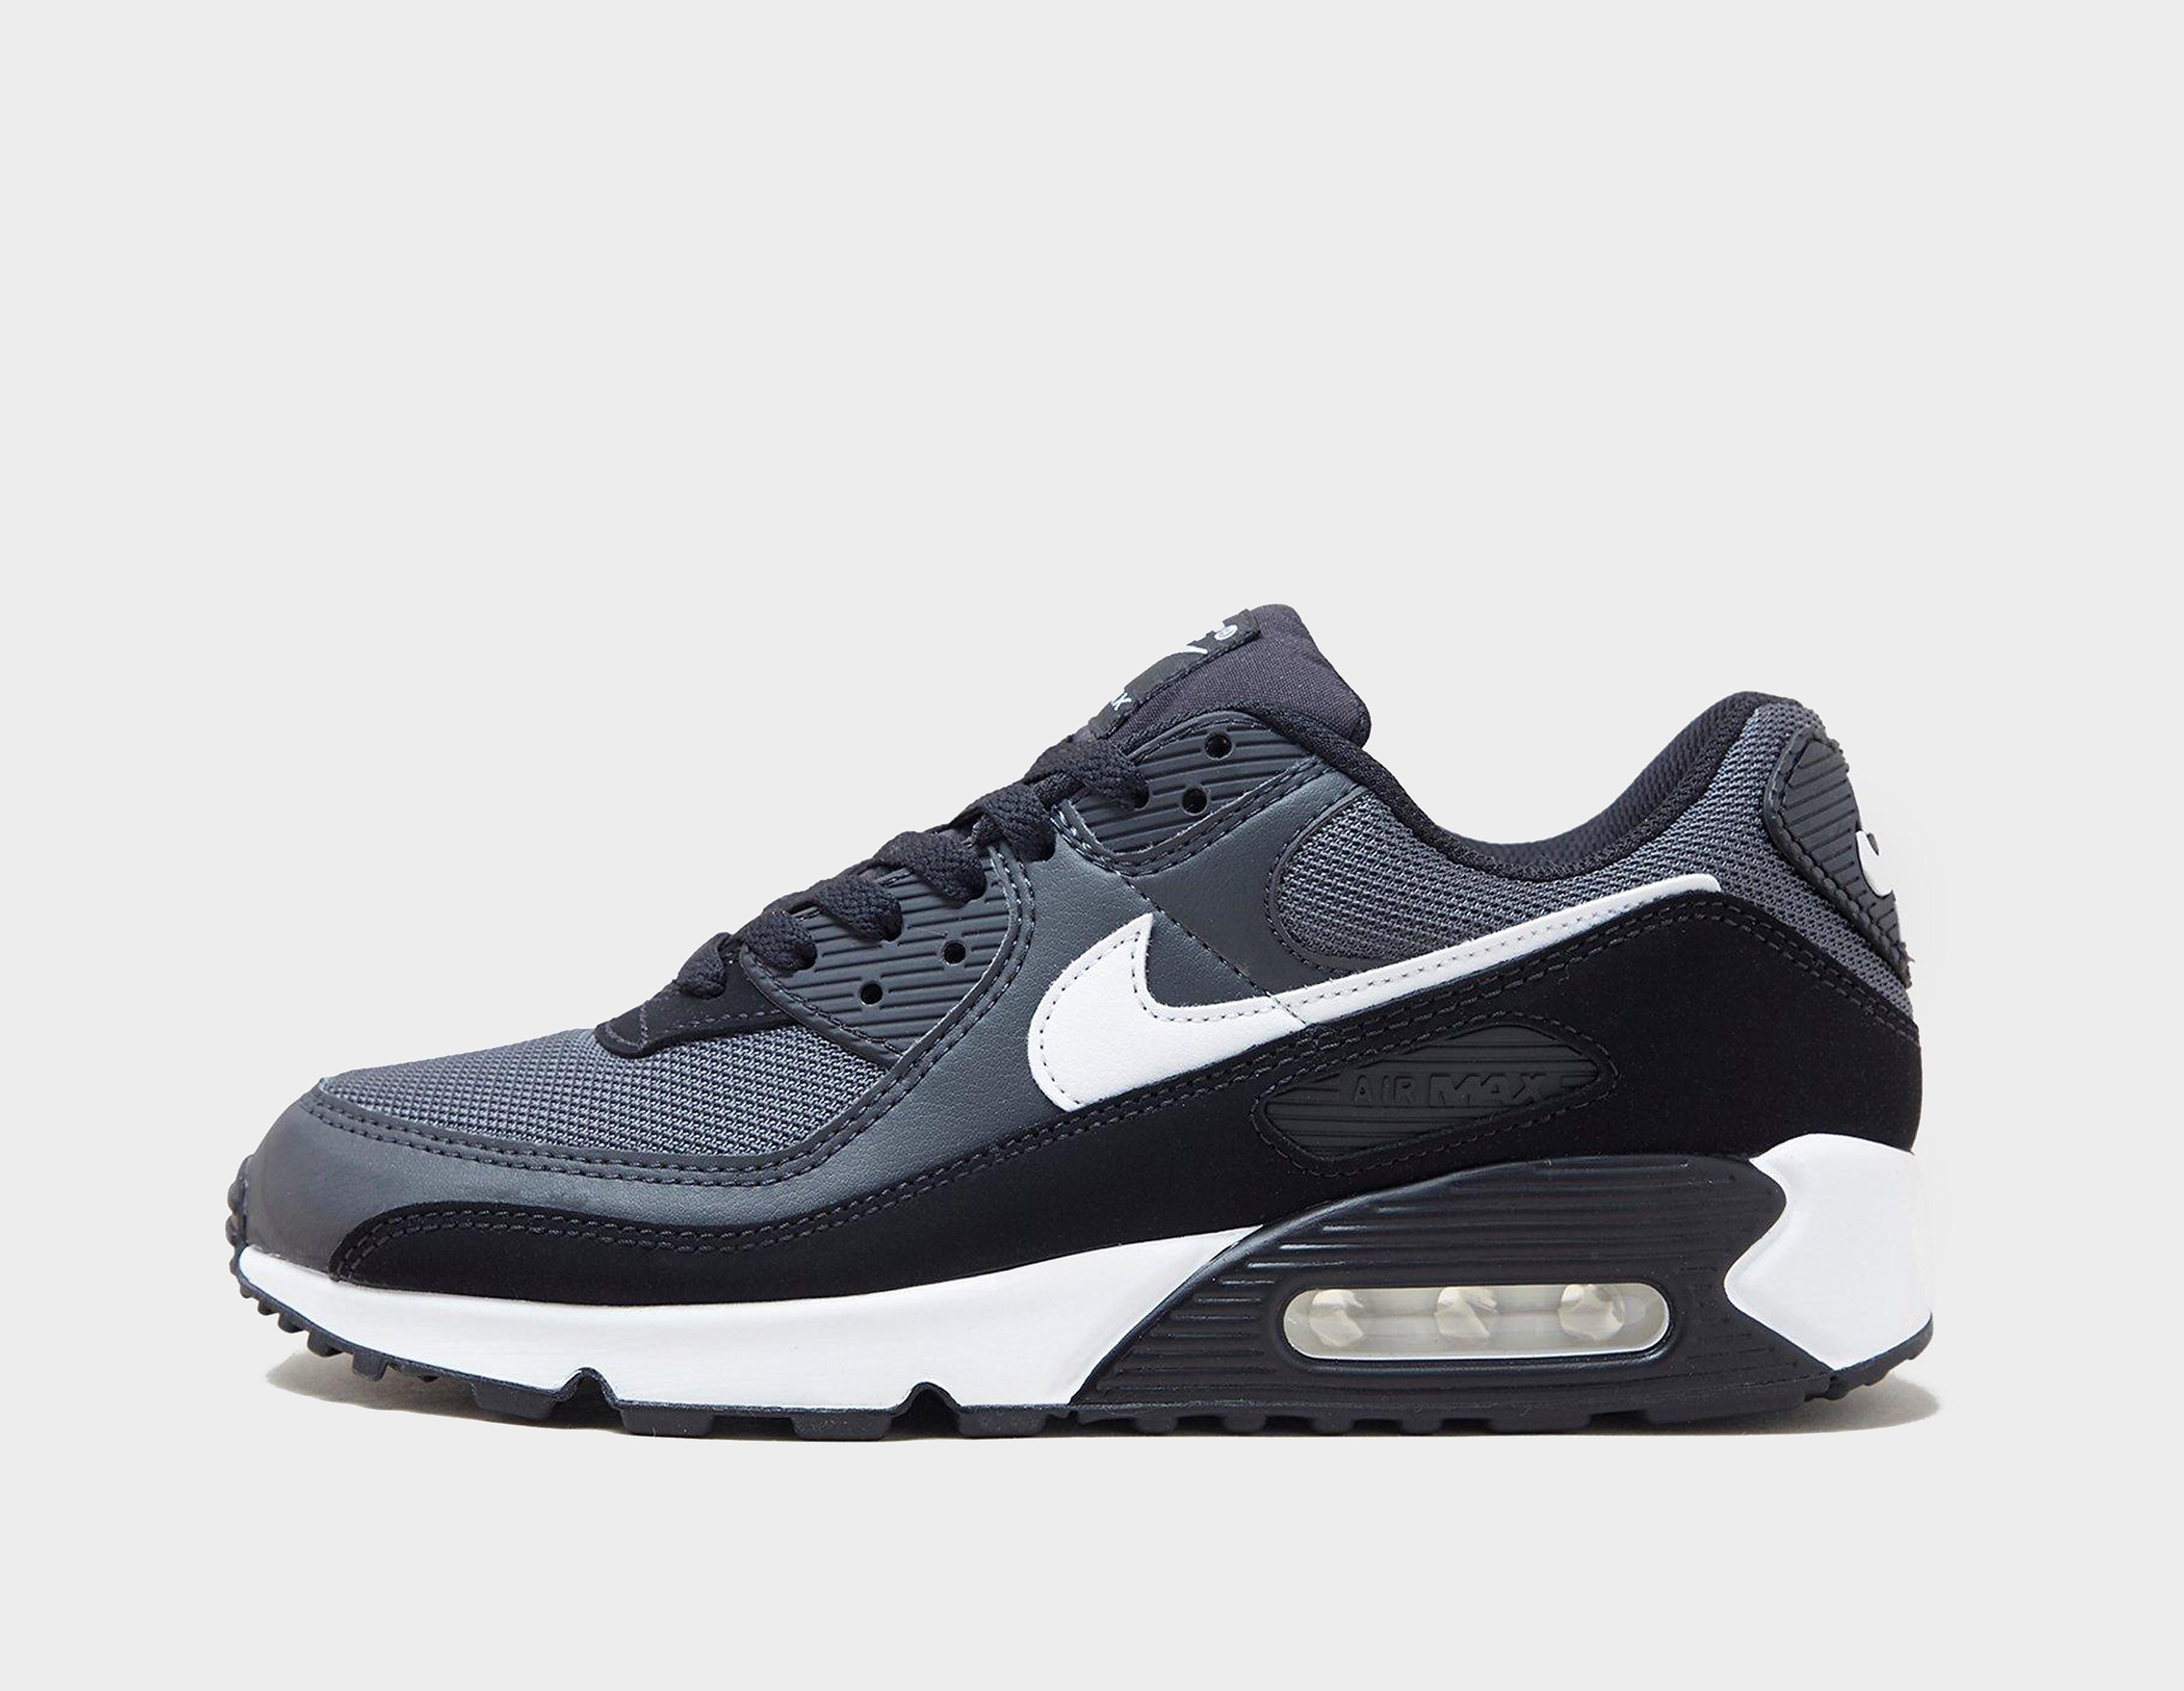 Nike Air Max 90, Gris